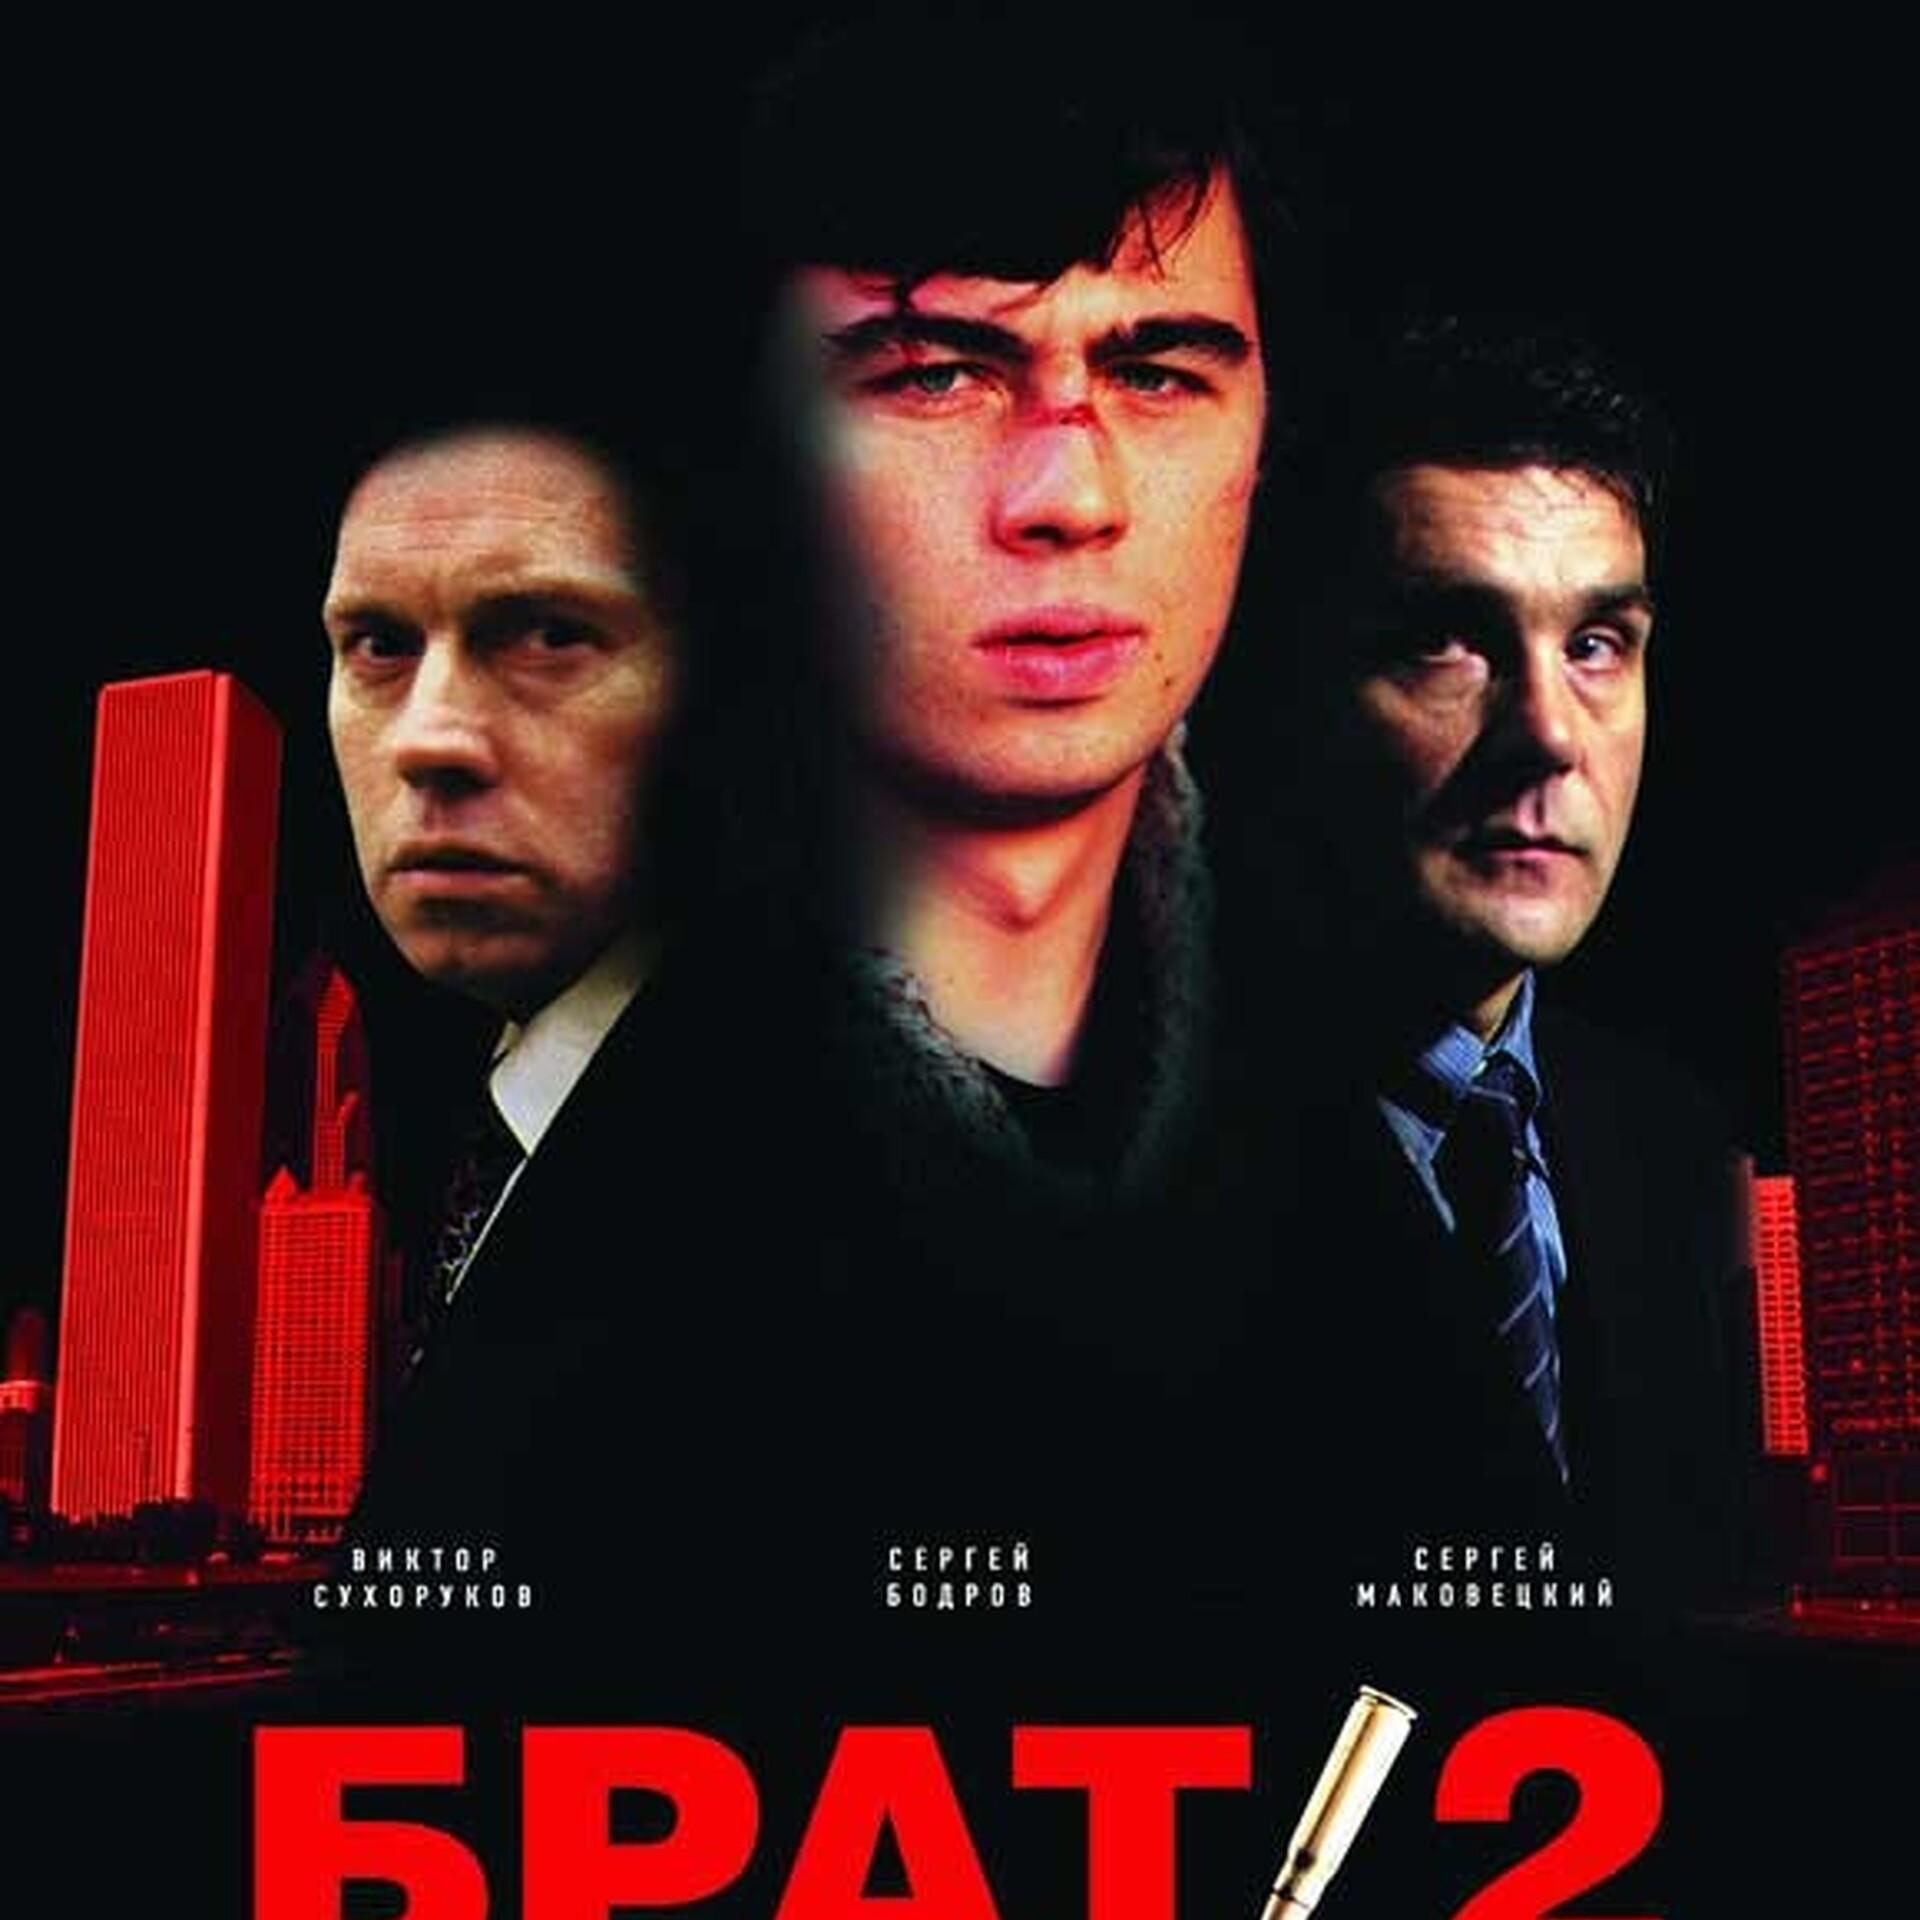 c6151bb8160 Ukraina keelab ära Vene filme | Film | ERR